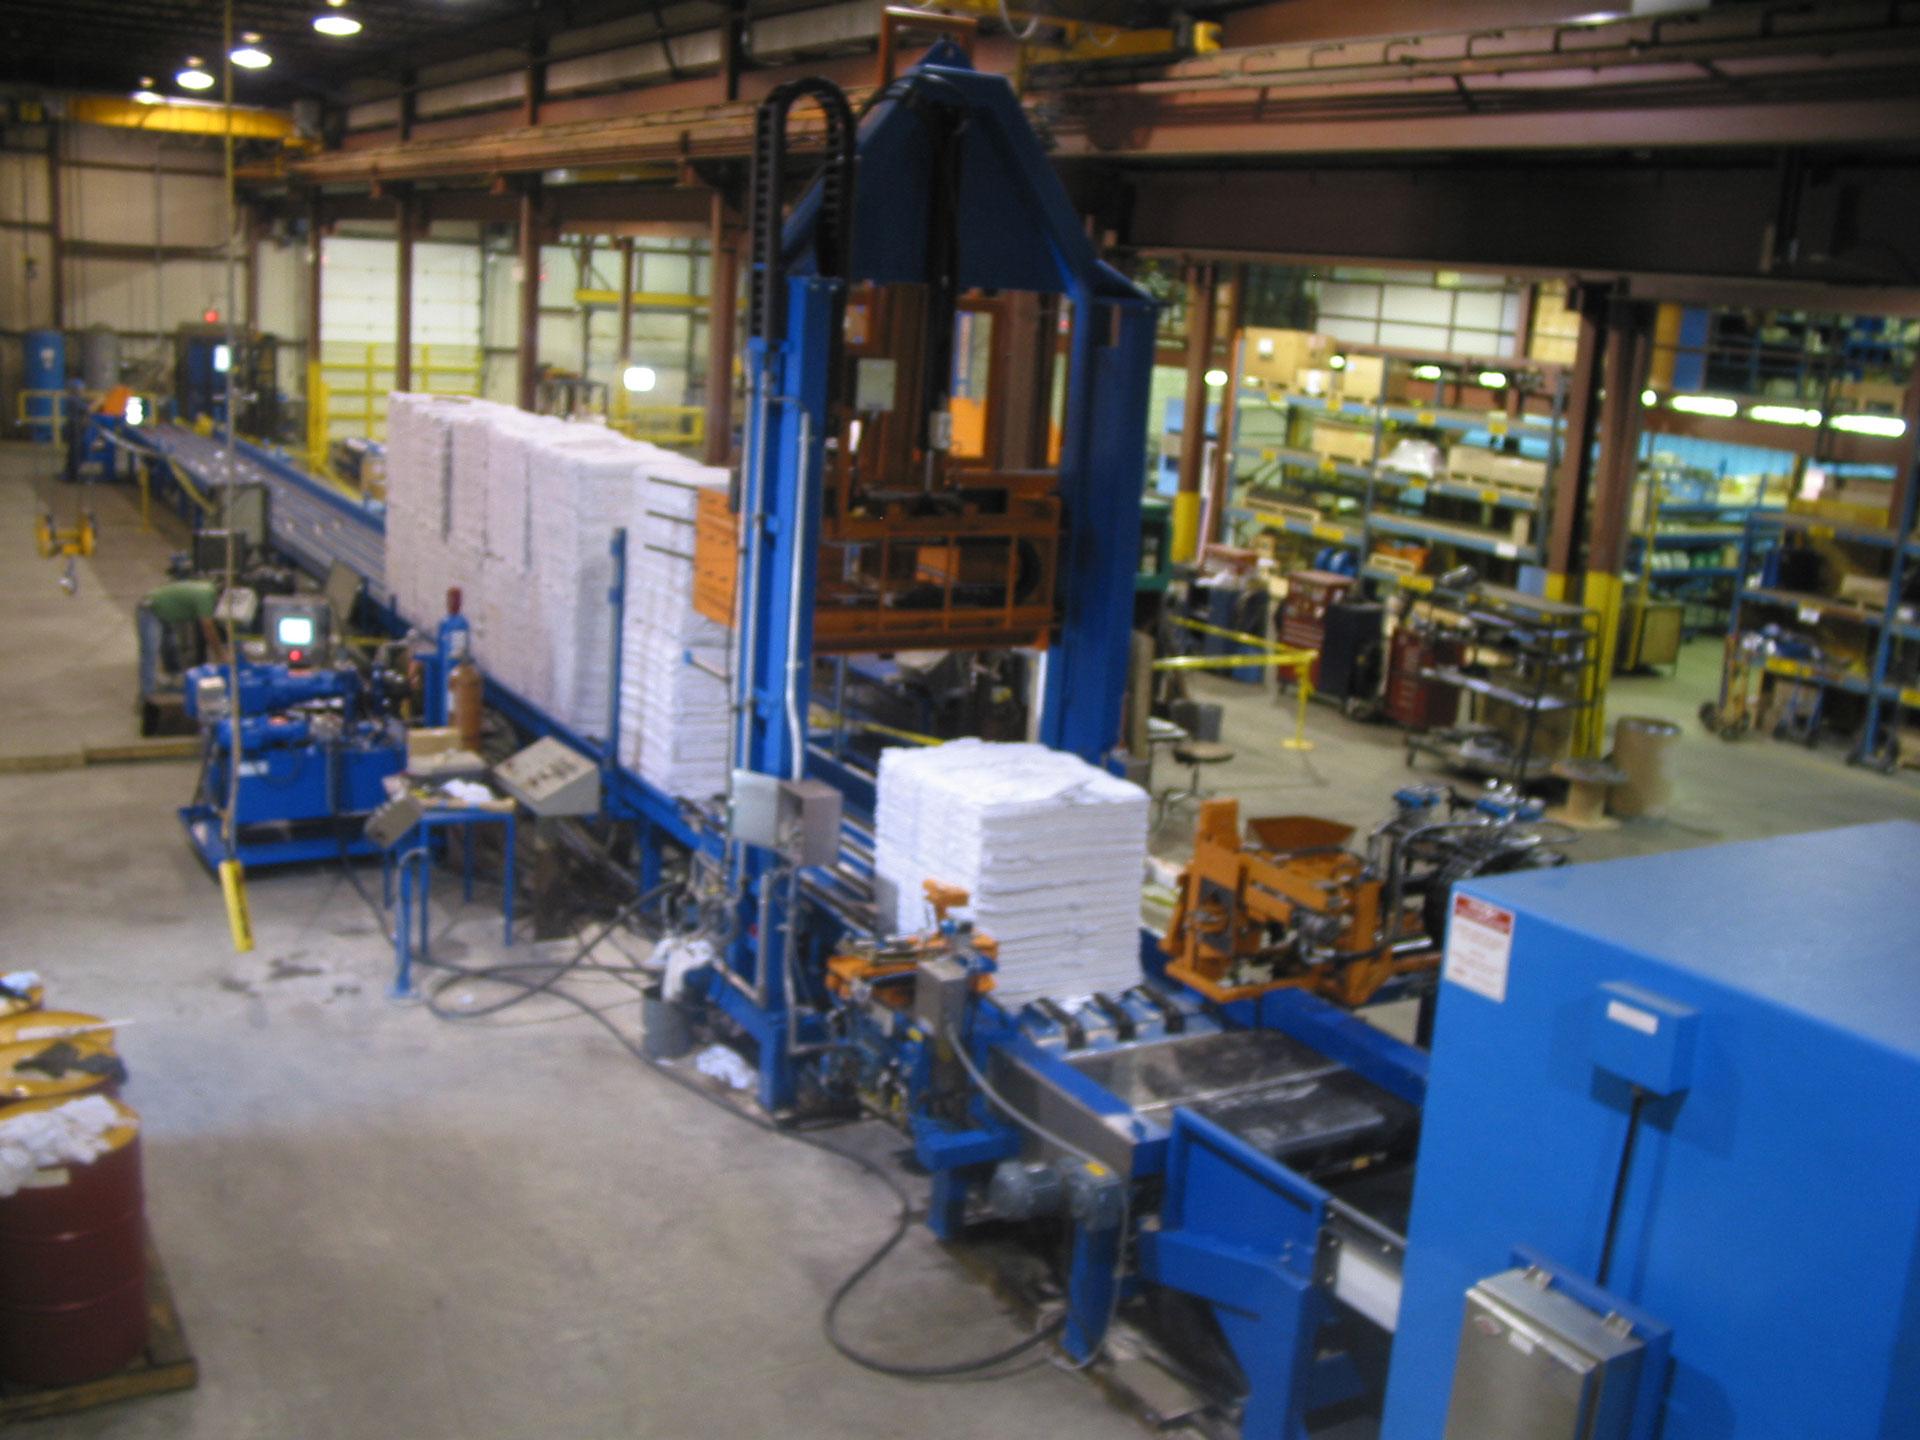 Paper---Pulper-Feed-Systems---Dewiring---pulp-_-wetlap-bale-dewire-2